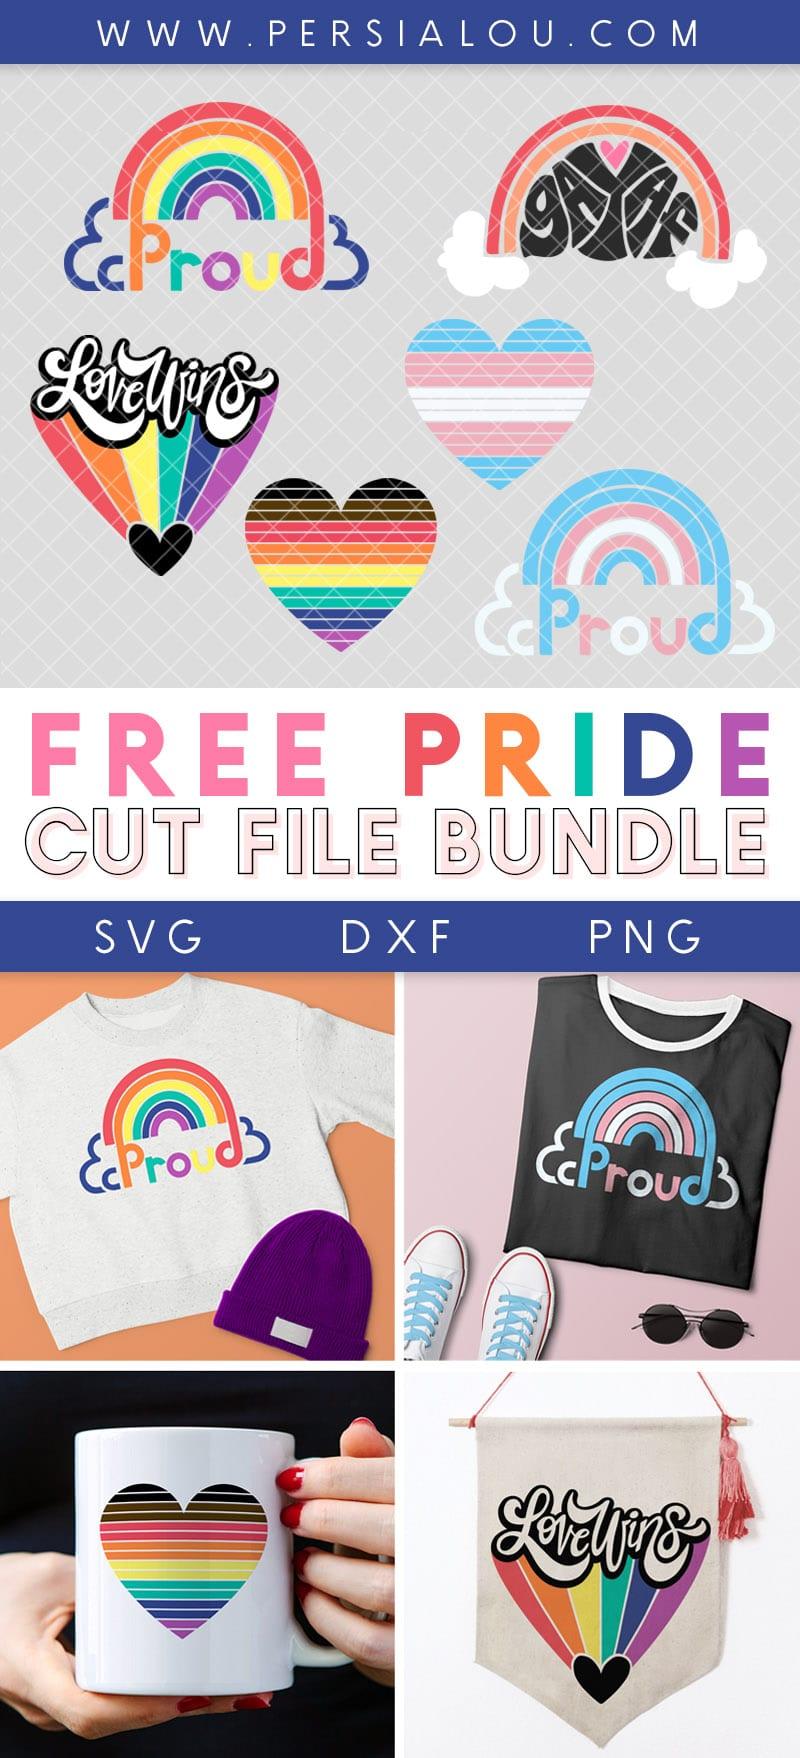 free lgbtqai+ svg cut file designs collage of pride cut file designs